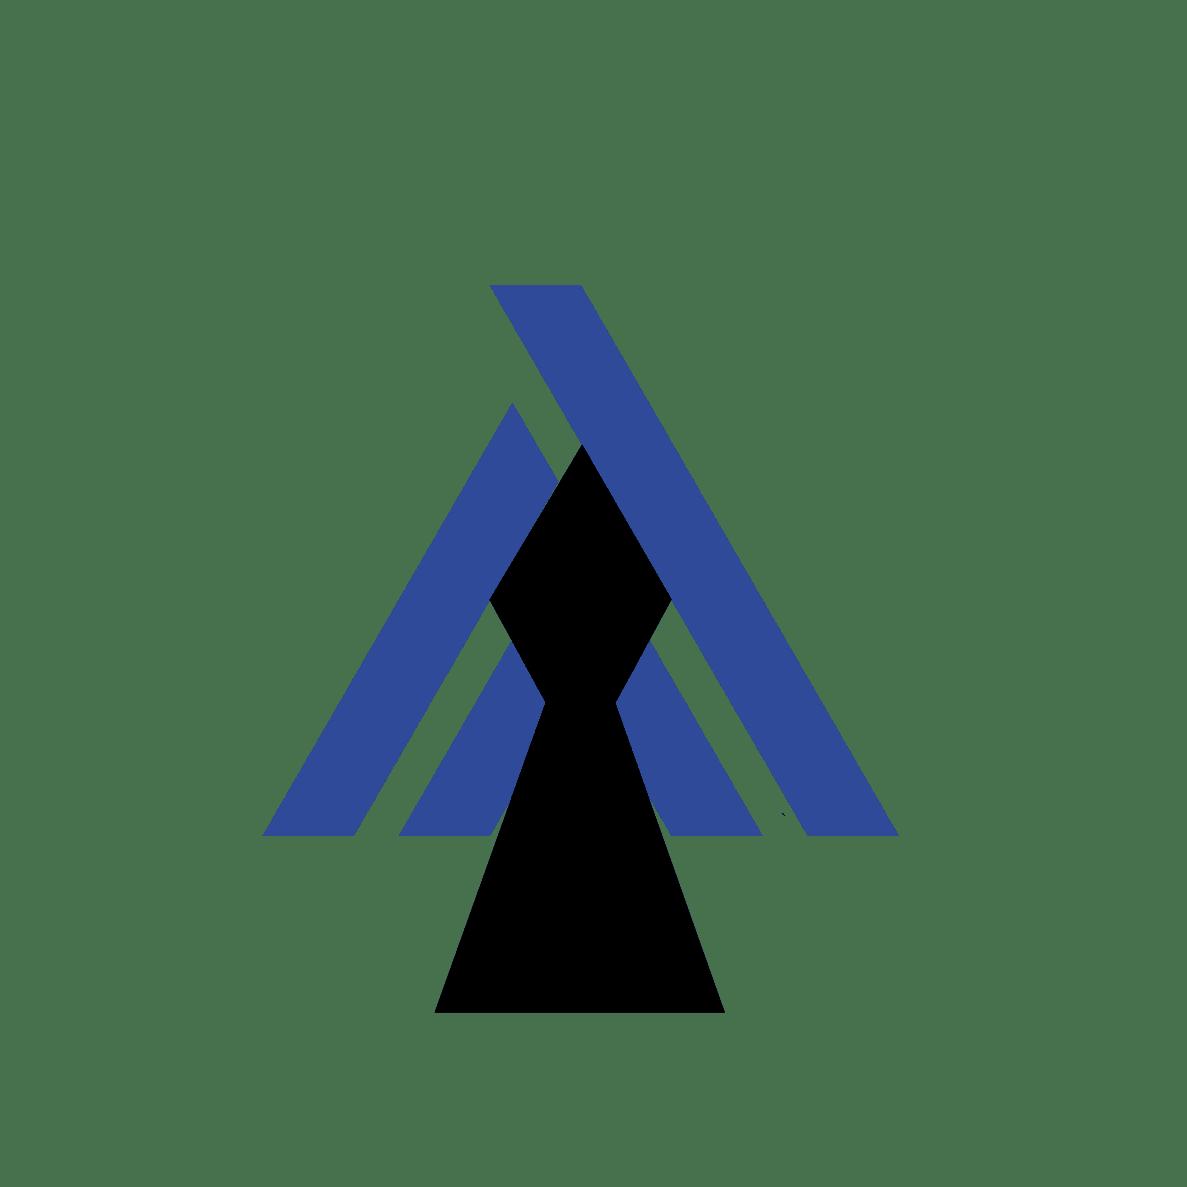 Logo_Blogpost-01